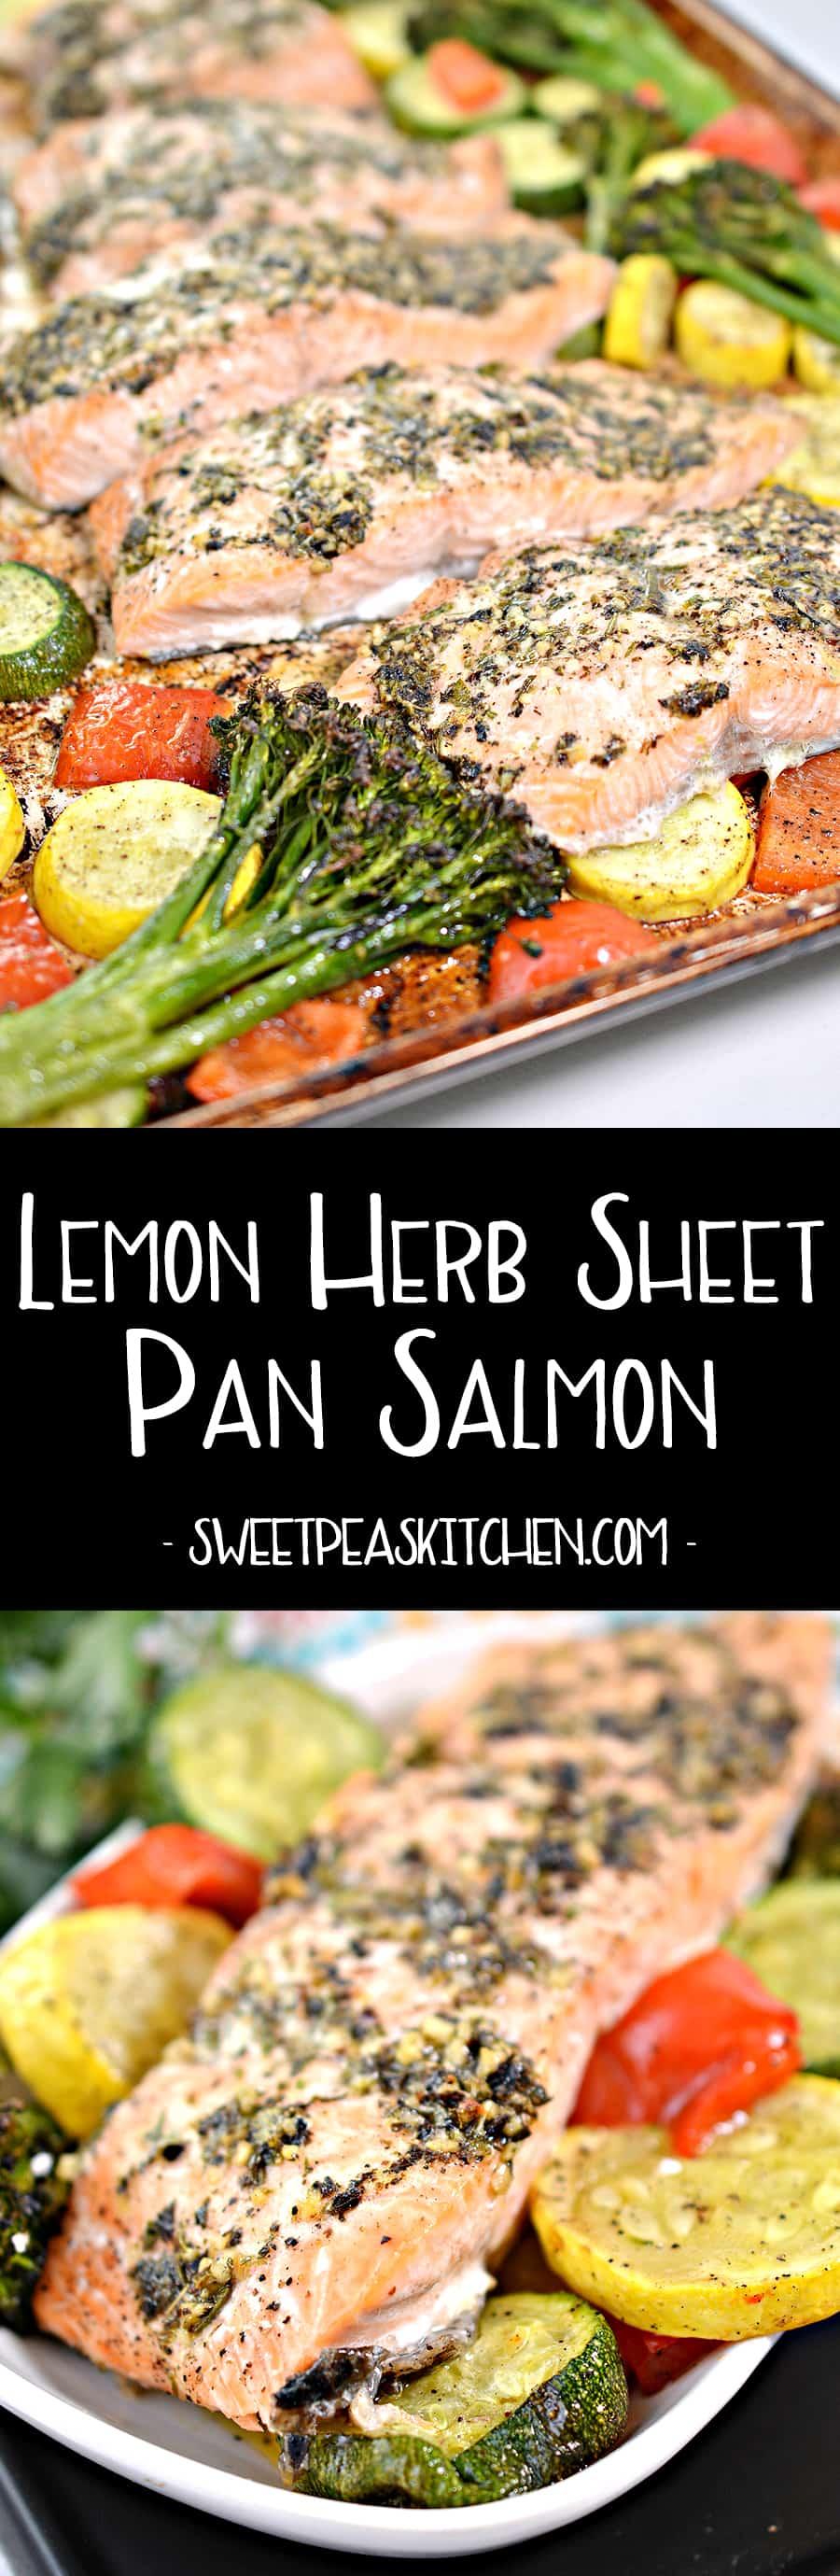 Lemon Herb Sheet Pan Salmon